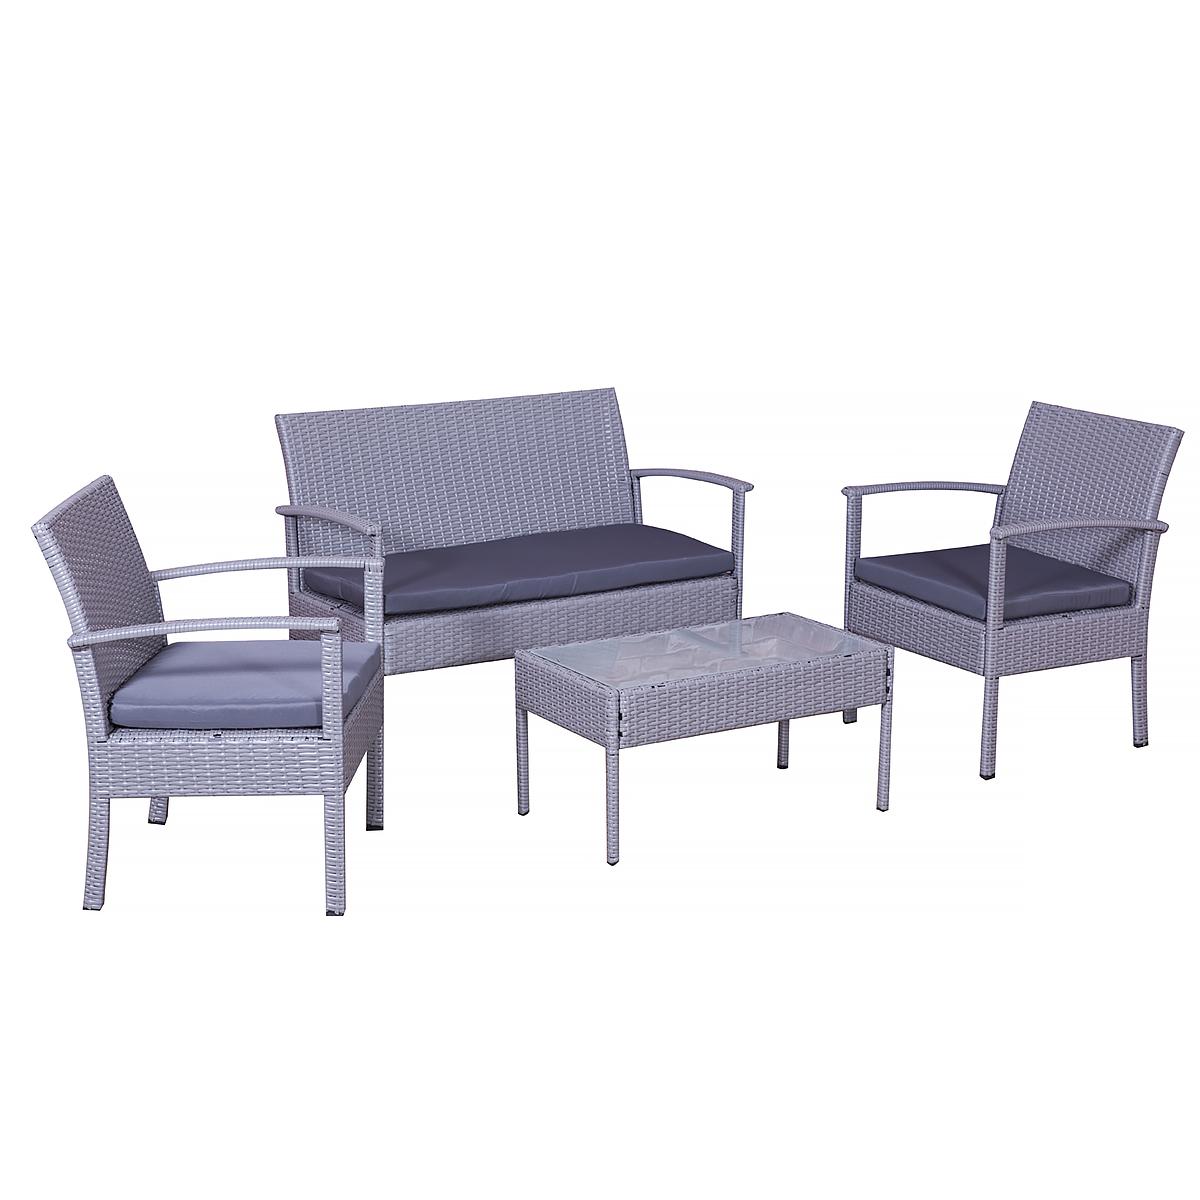 grenoble in grau grau gartenset garten lounge neu. Black Bedroom Furniture Sets. Home Design Ideas